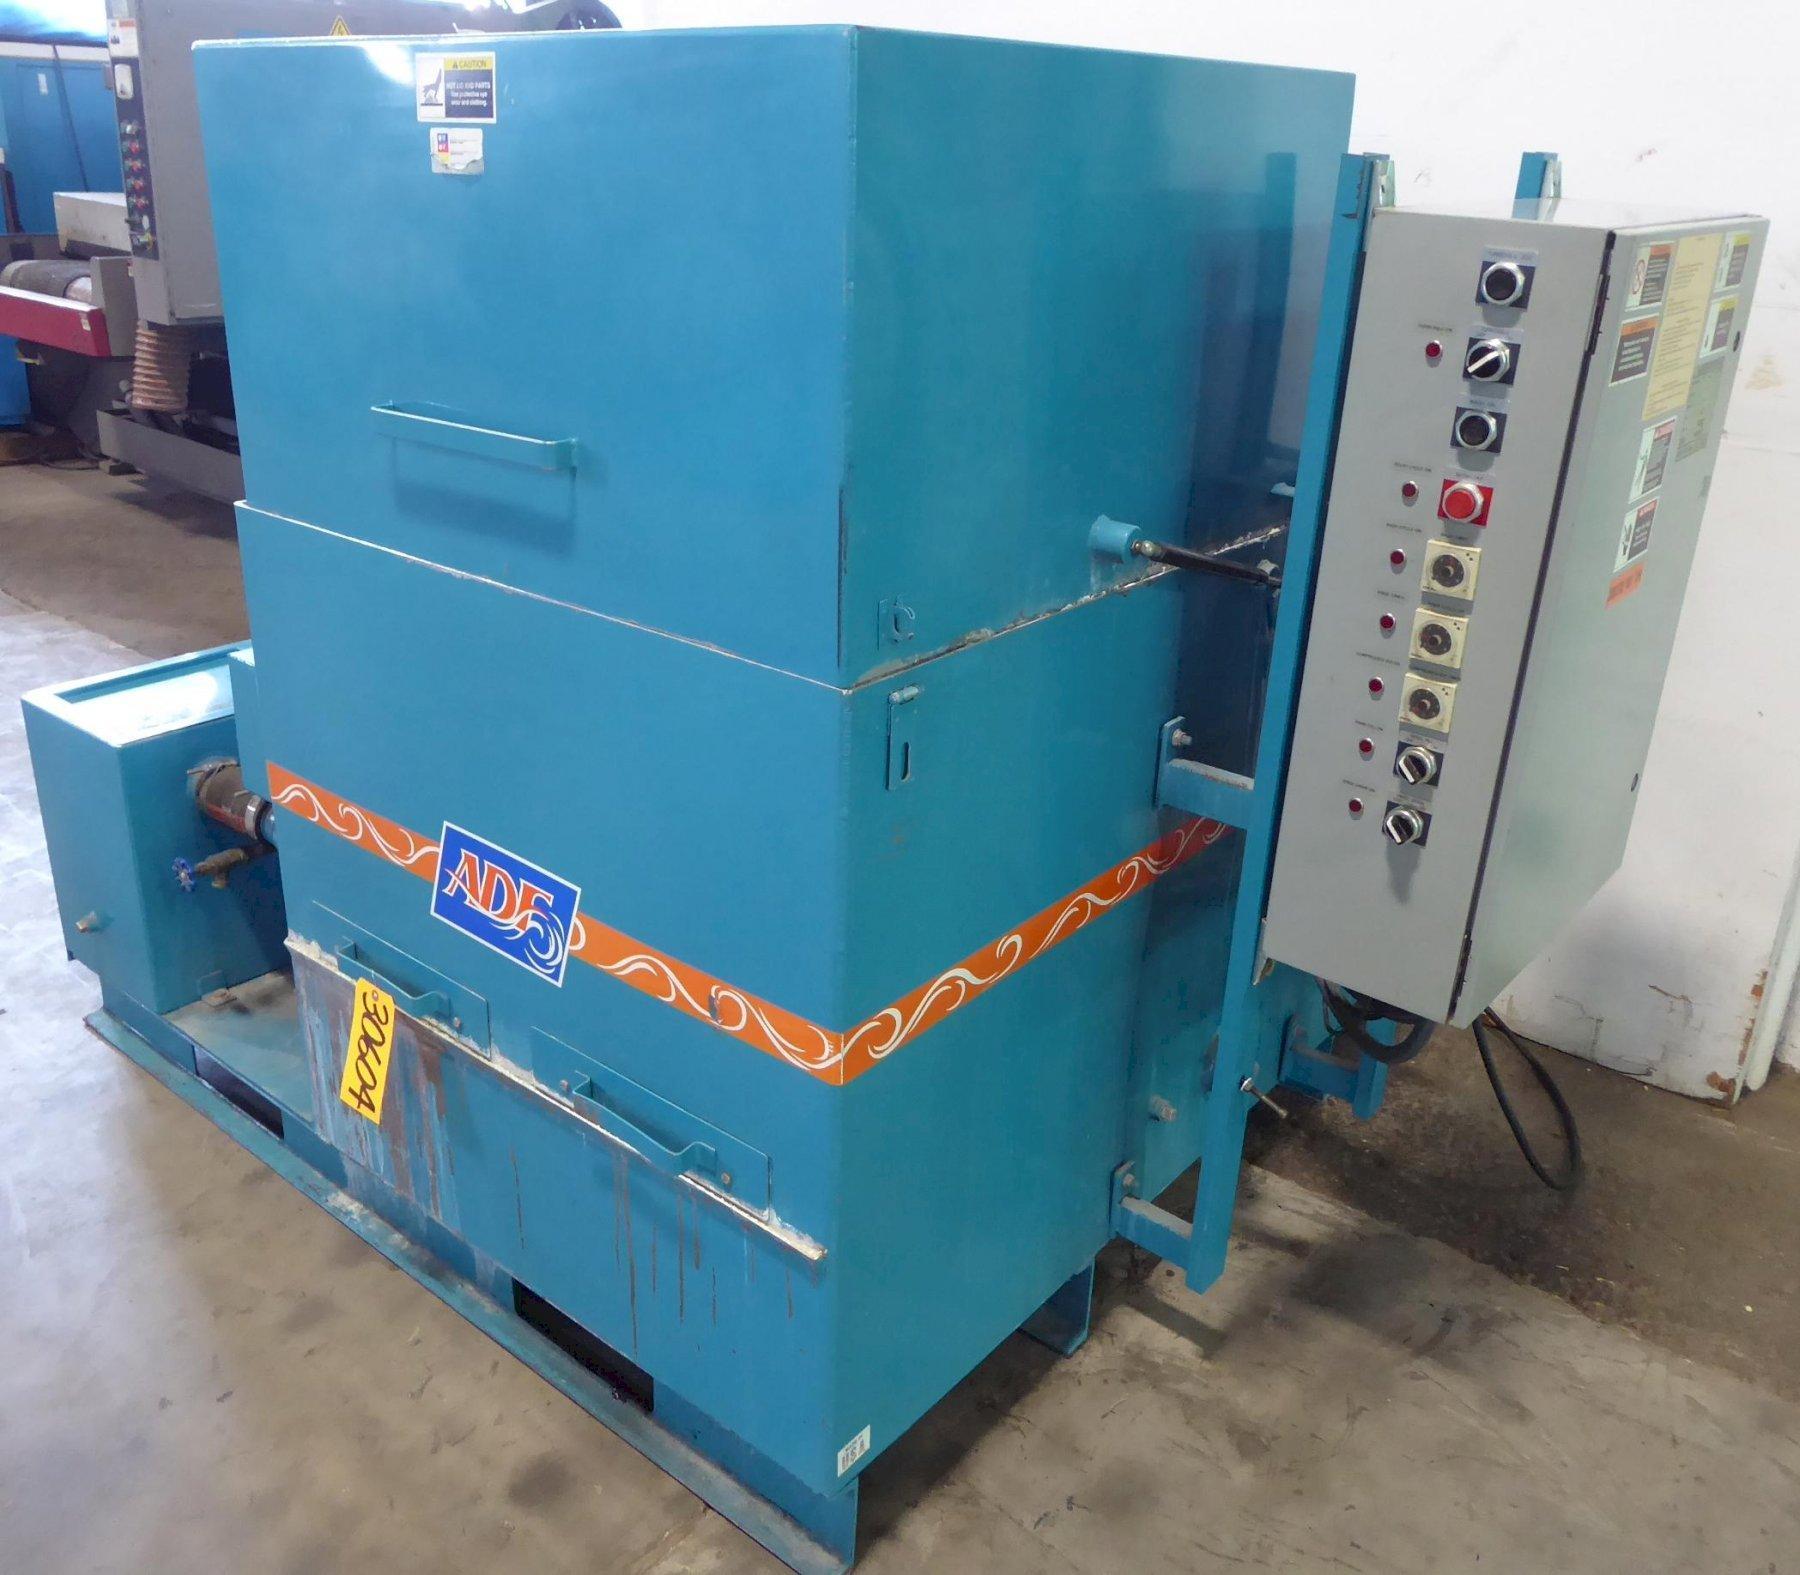 "ADF Top Load Load Low Pressure High Volume Parts Washer, Model 200, 28"" Diameter Turntable, 500 Lb. Capacity, 200 Deg. F, 100 Gallon Tank, 3 HP, 2010"